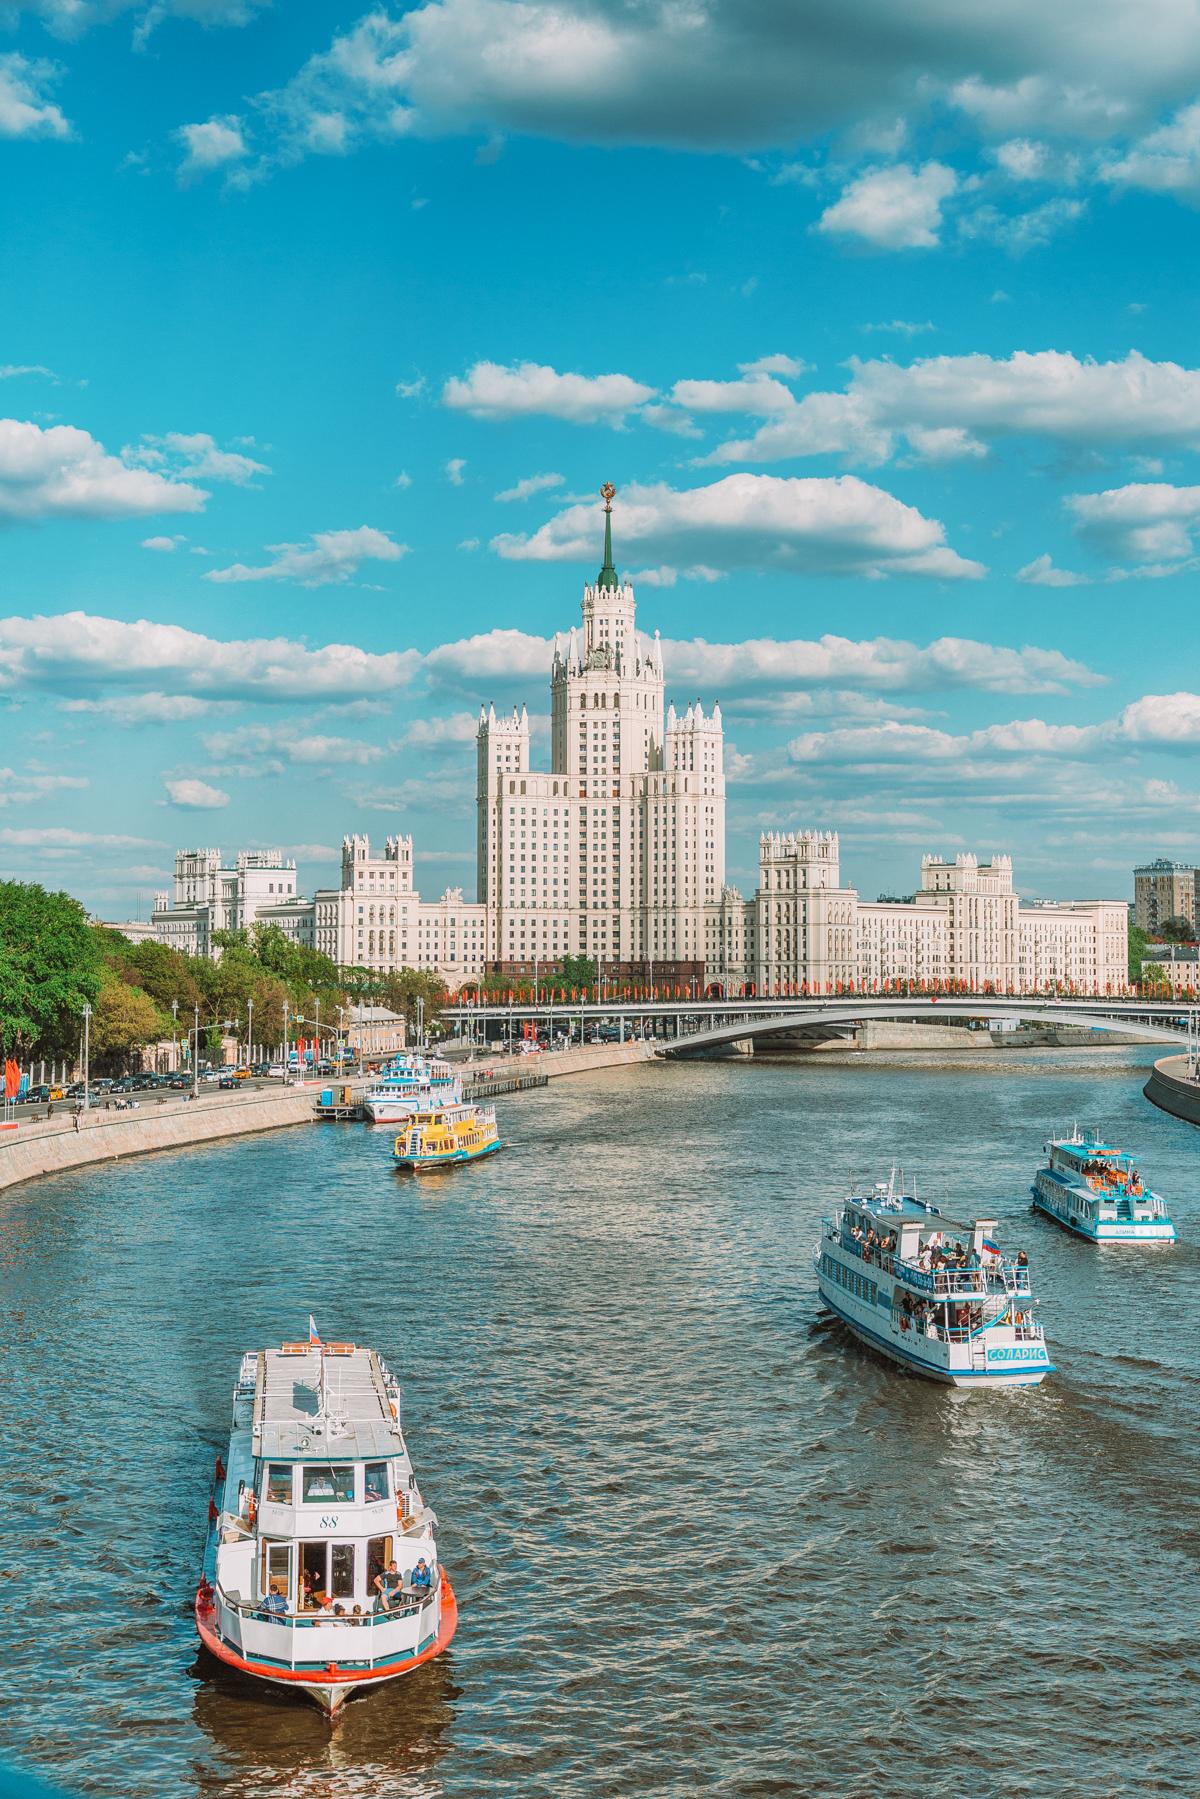 thestylejungle_Russia_Moscow_Zaryadye_park_travelblog